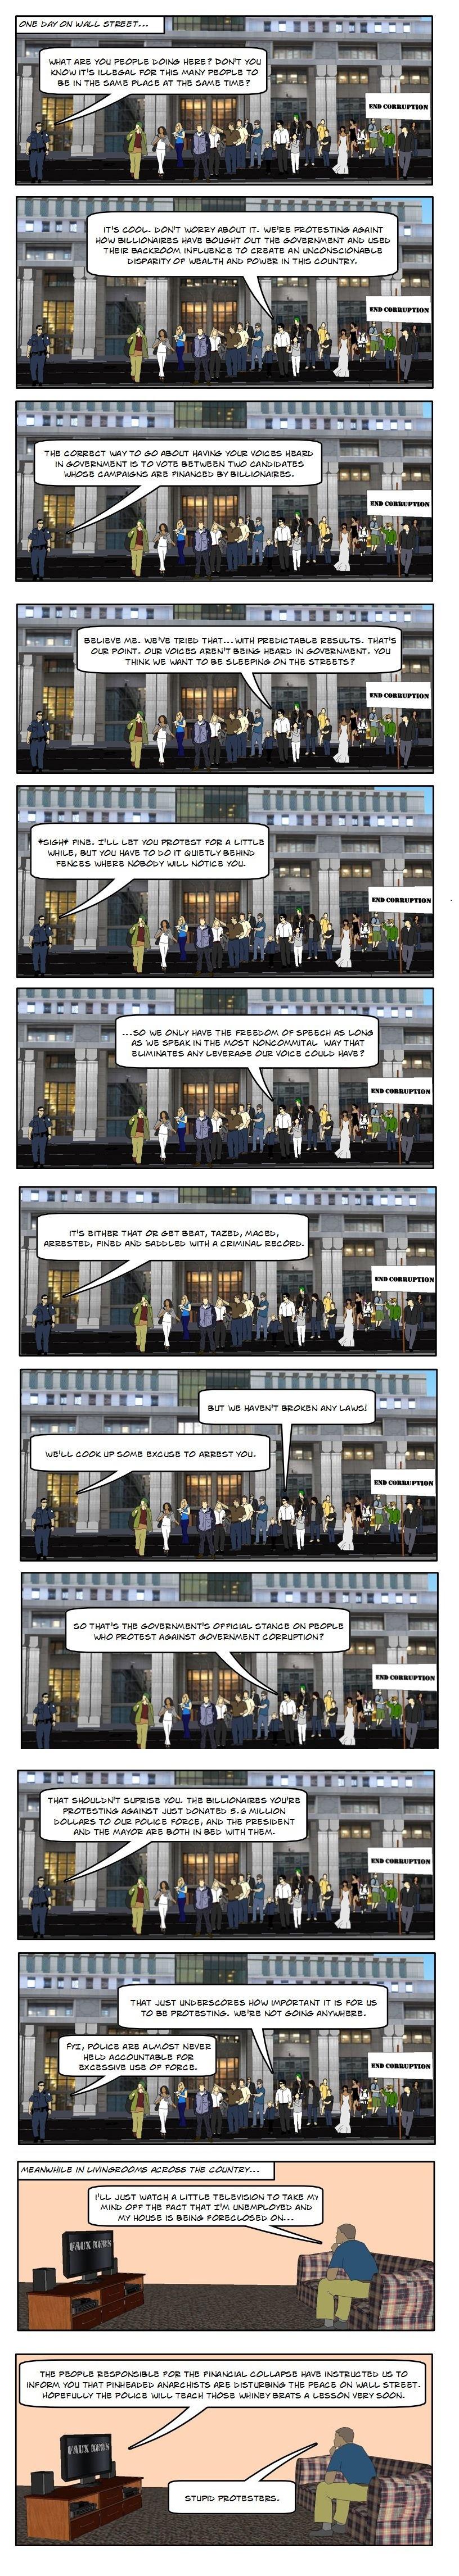 (Comic) How Civilians Protesting Works